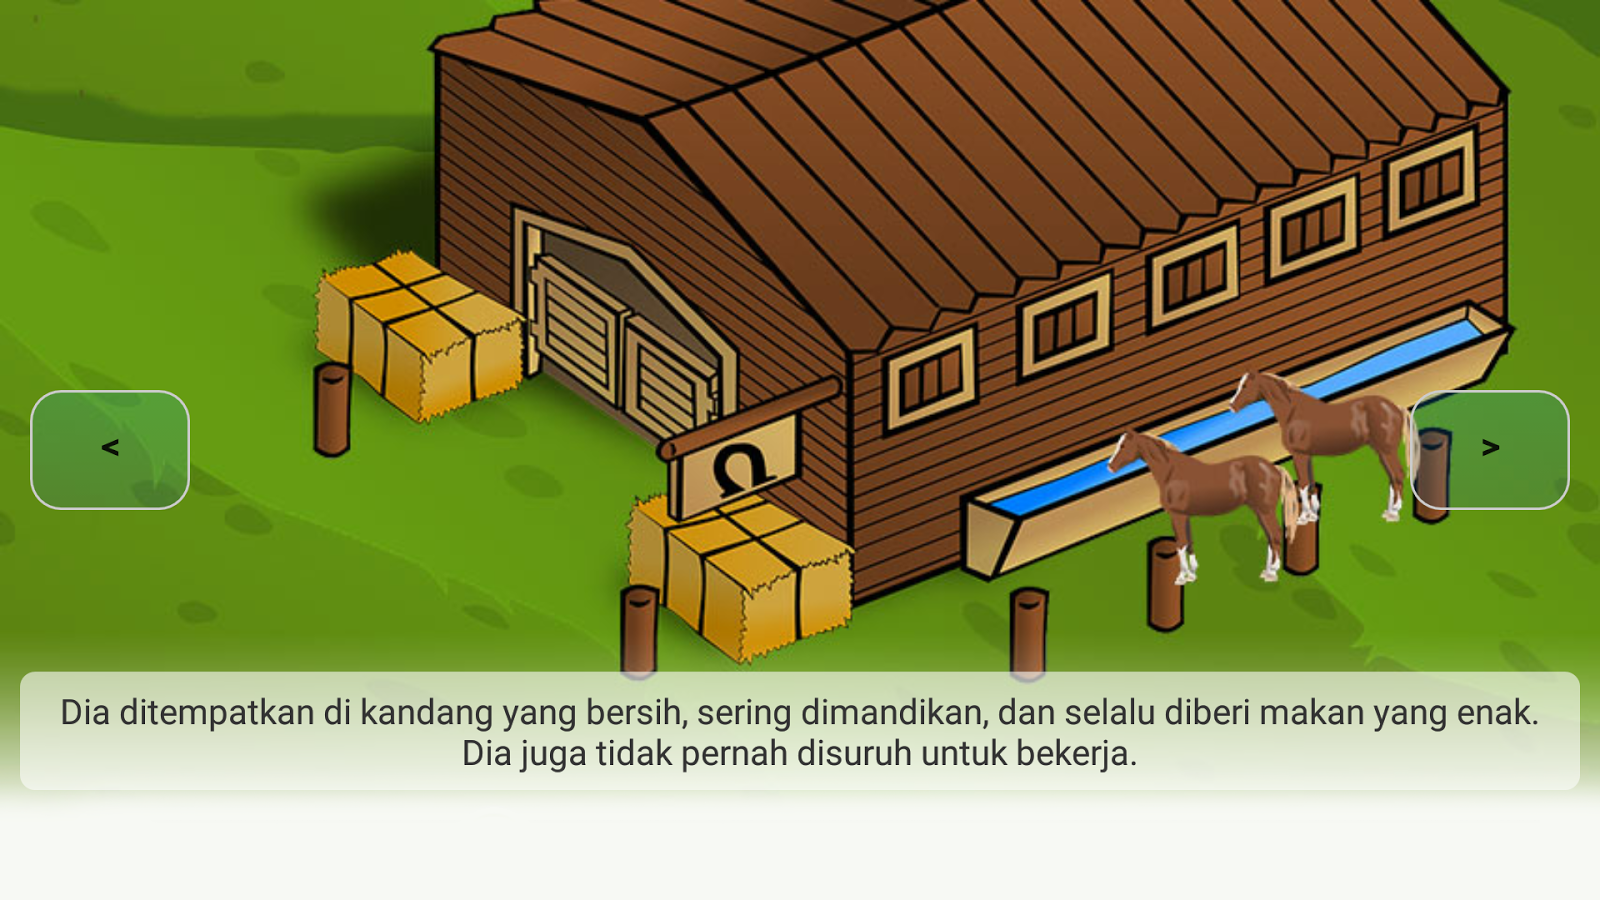 Kumpulan Cerita Dongeng Anak Android Apps On Google Play